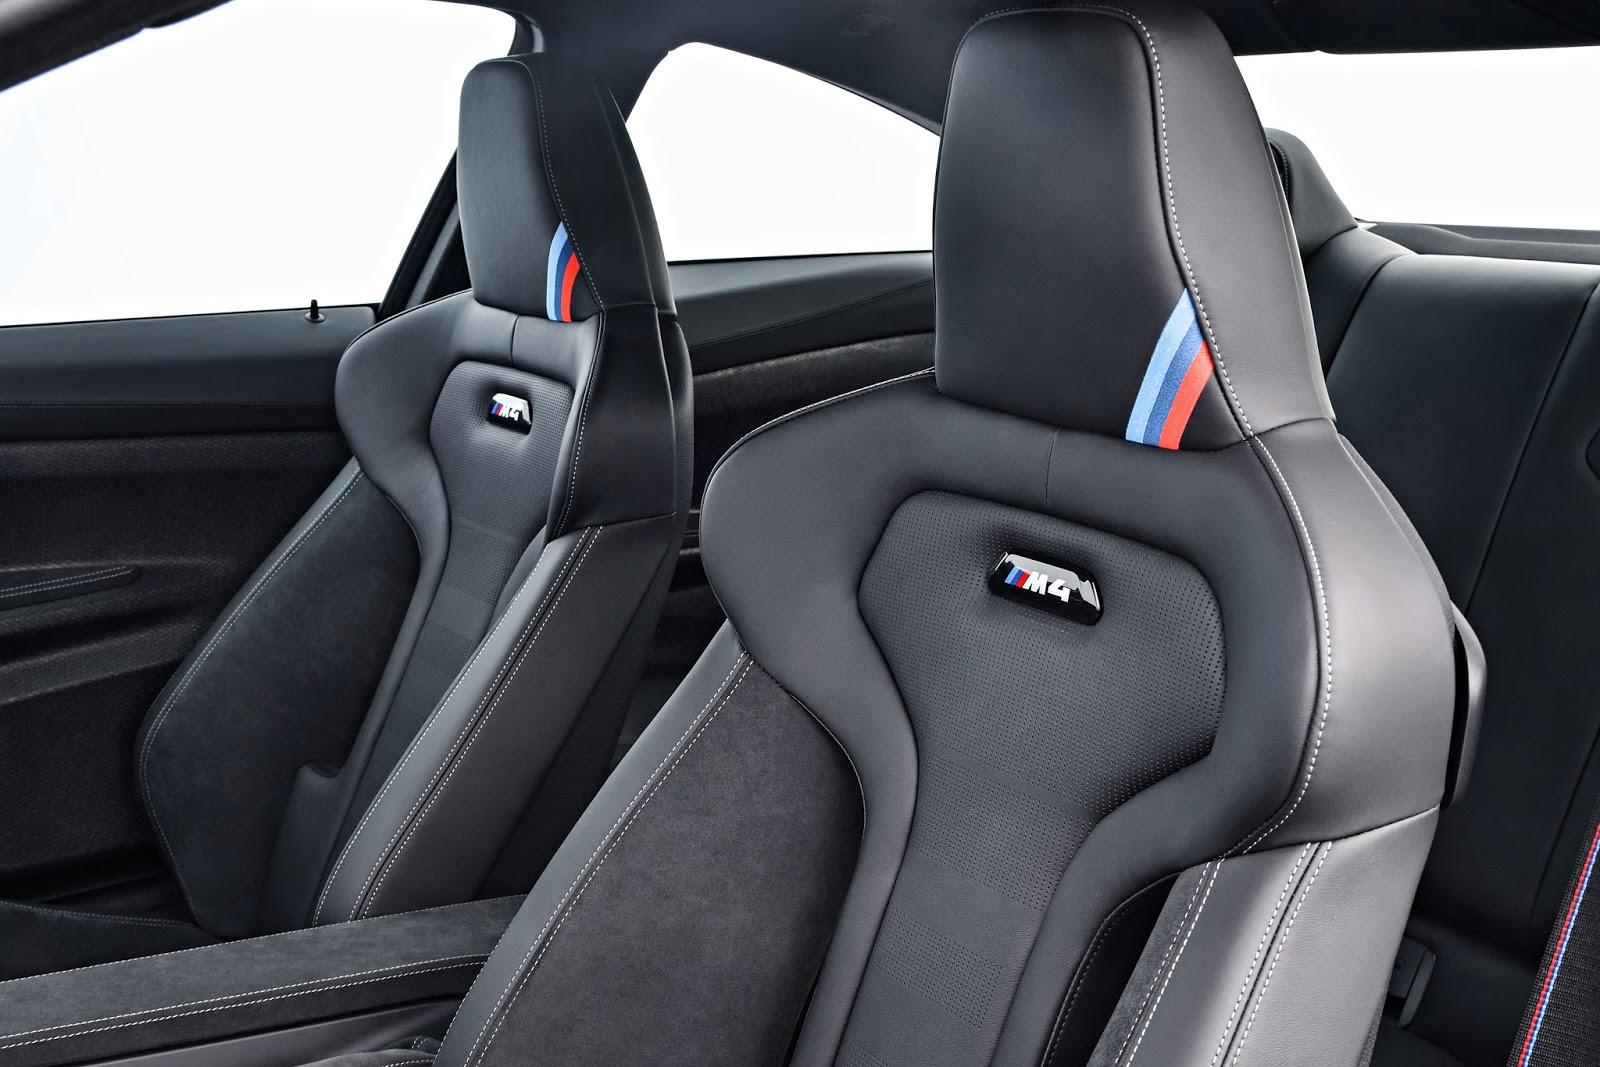 P90251063 highRes the new bmw m4 cs 04 Η περιορισμένης παραγωγής BMW M4 ClubSport δική σας με 116.900 ευρώ BMW, BMW M, BMW M4, BMW M4 CS, BMW Motorsport, clubsport, COUPE, Limited edition, supercars, supersport, videos, Περιορισμένης παραγωγής